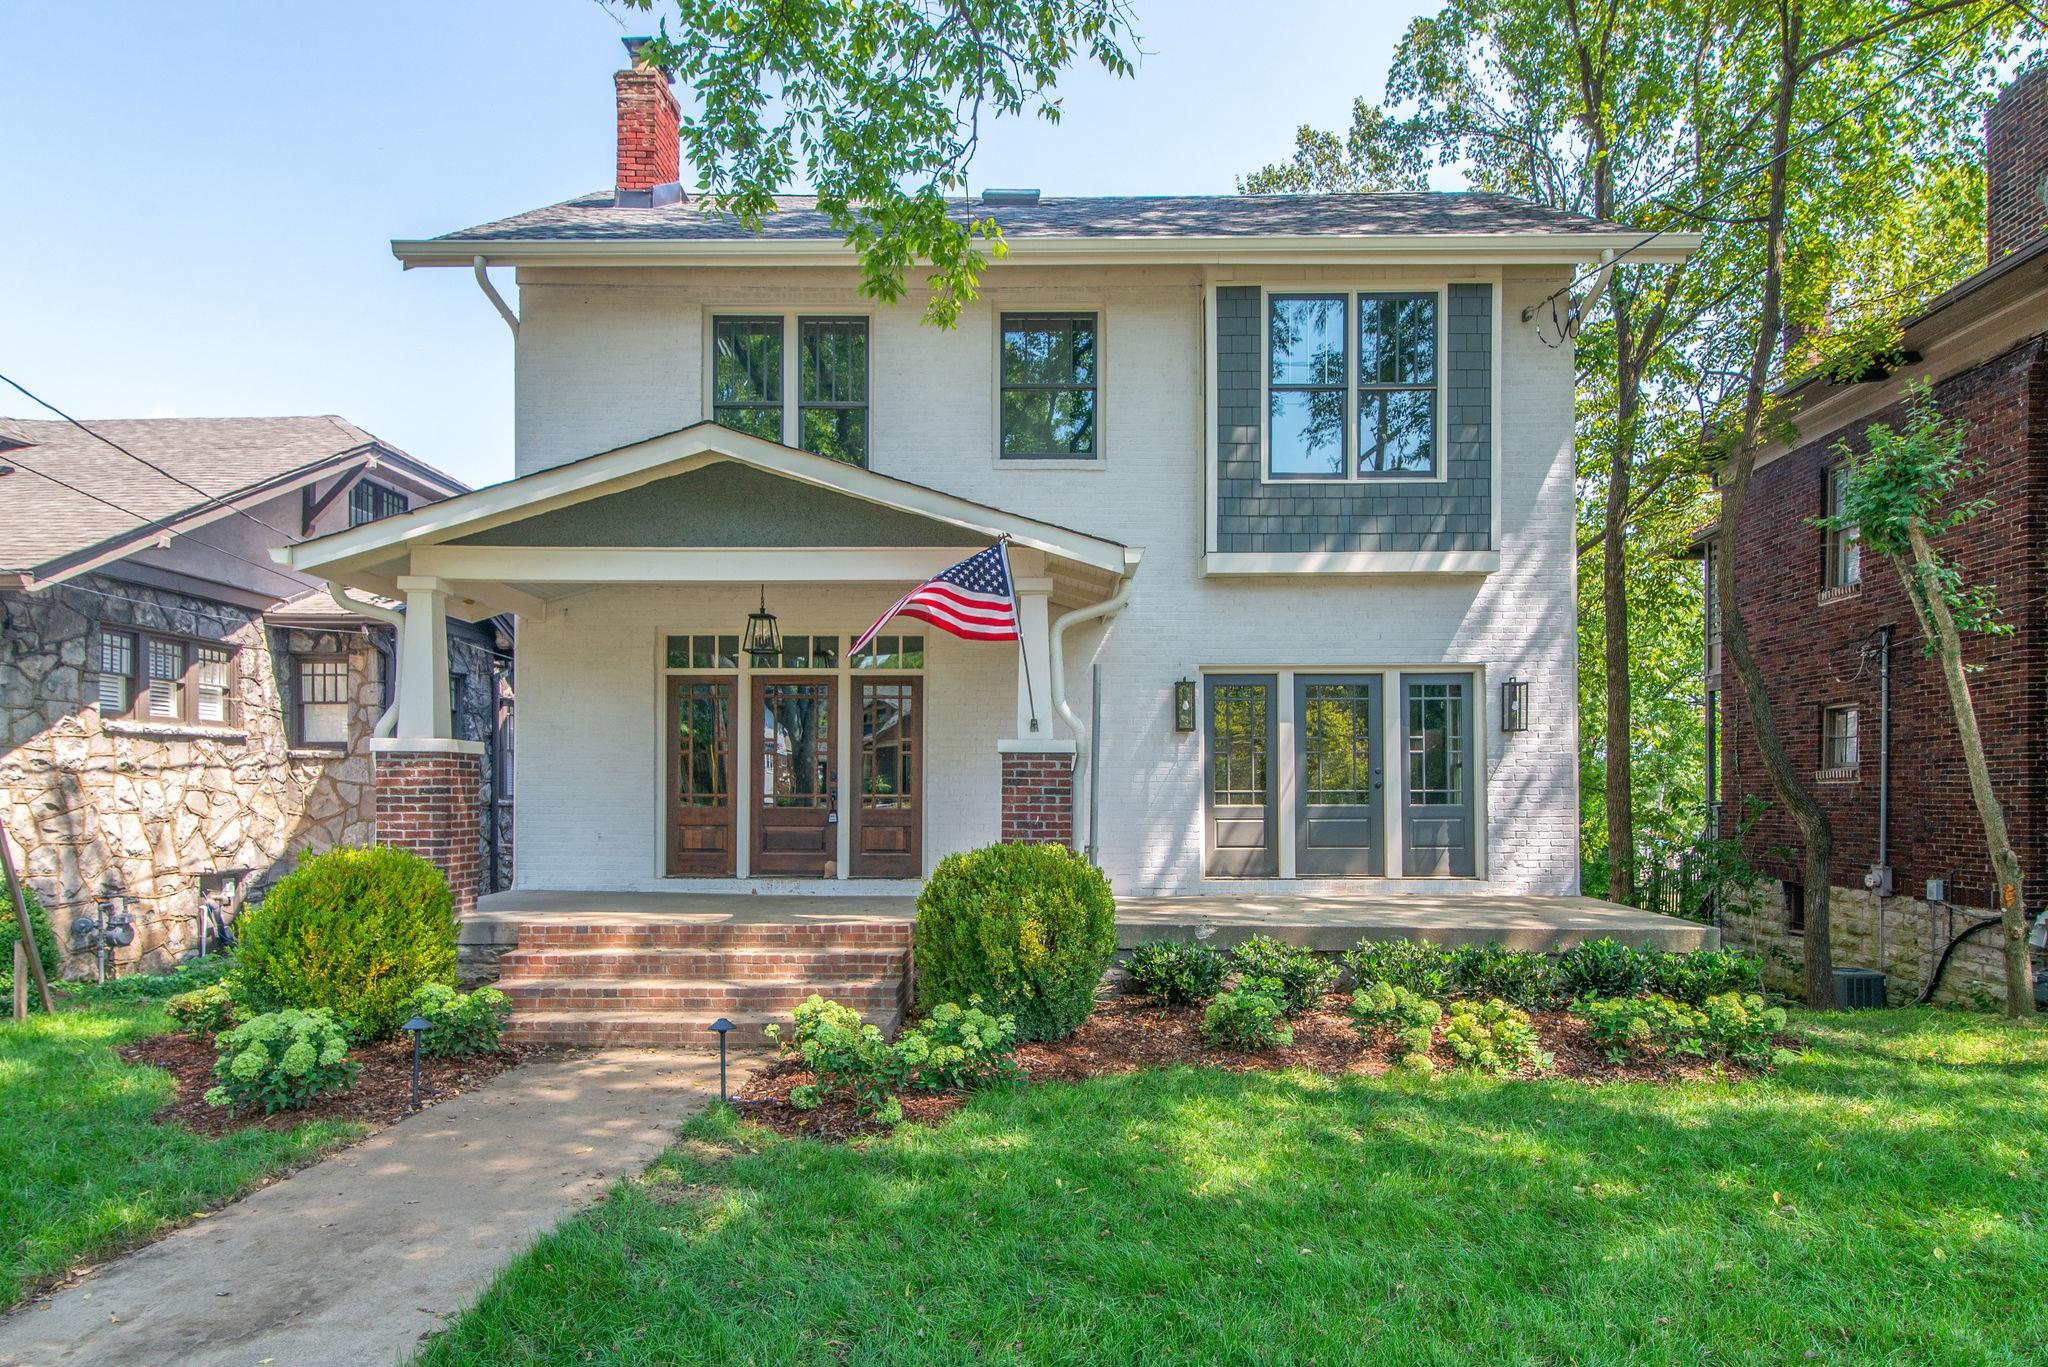 2310 Belmont Blvd, Nashville, TN 37212 - Nashville, TN real estate listing